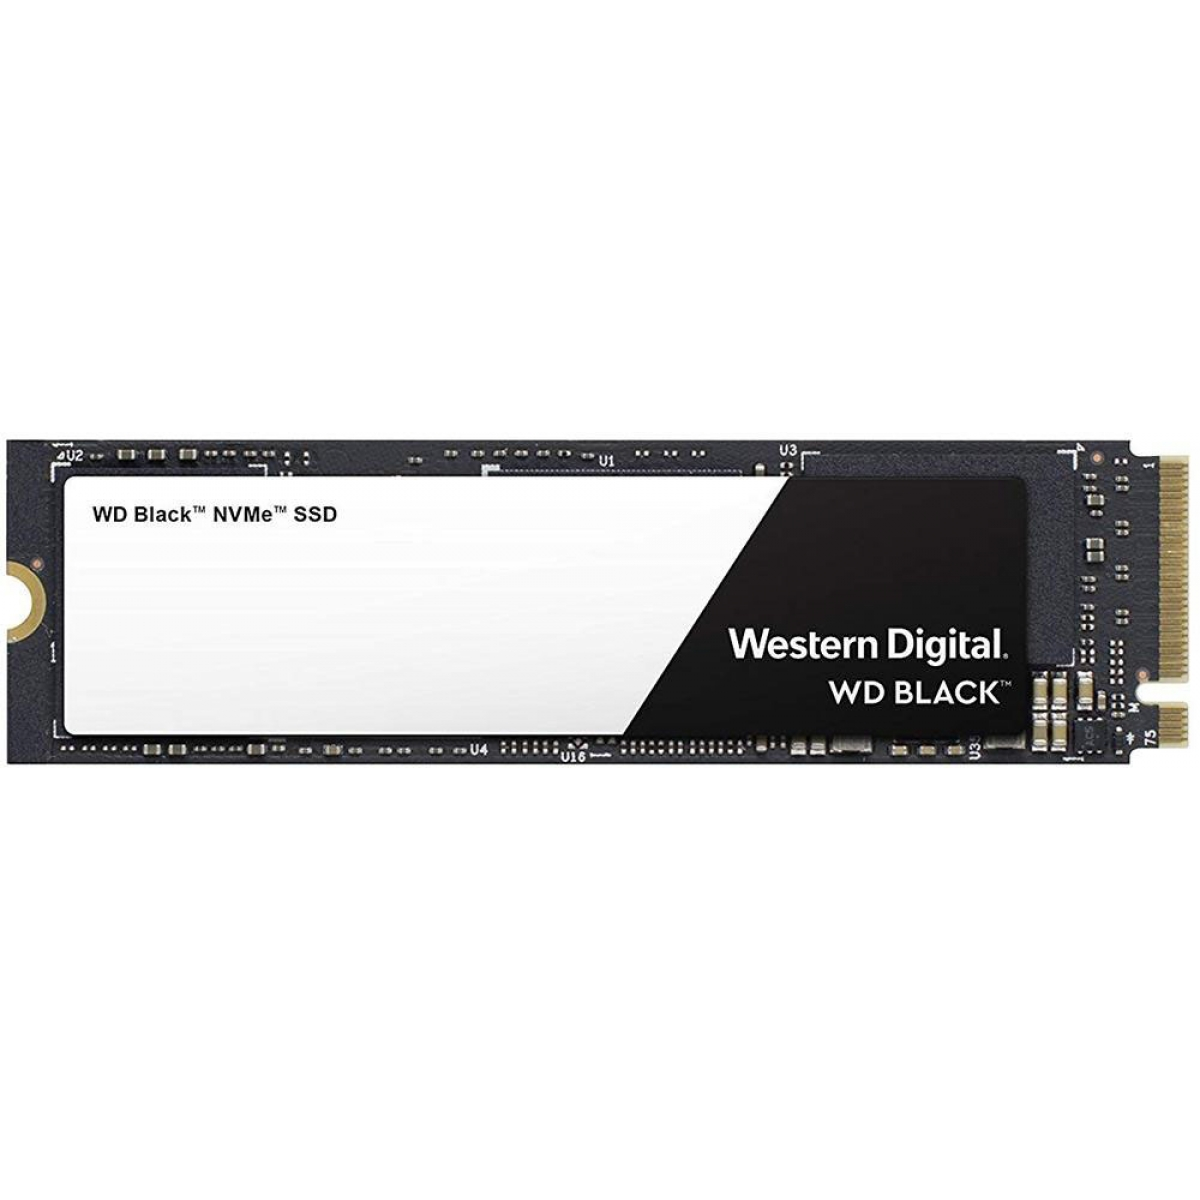 SSD WD Black, 500GB, M.2 2280, NVMe, Leitura 3400MBs e Gravação 2500MBs, WDS500G2X0C